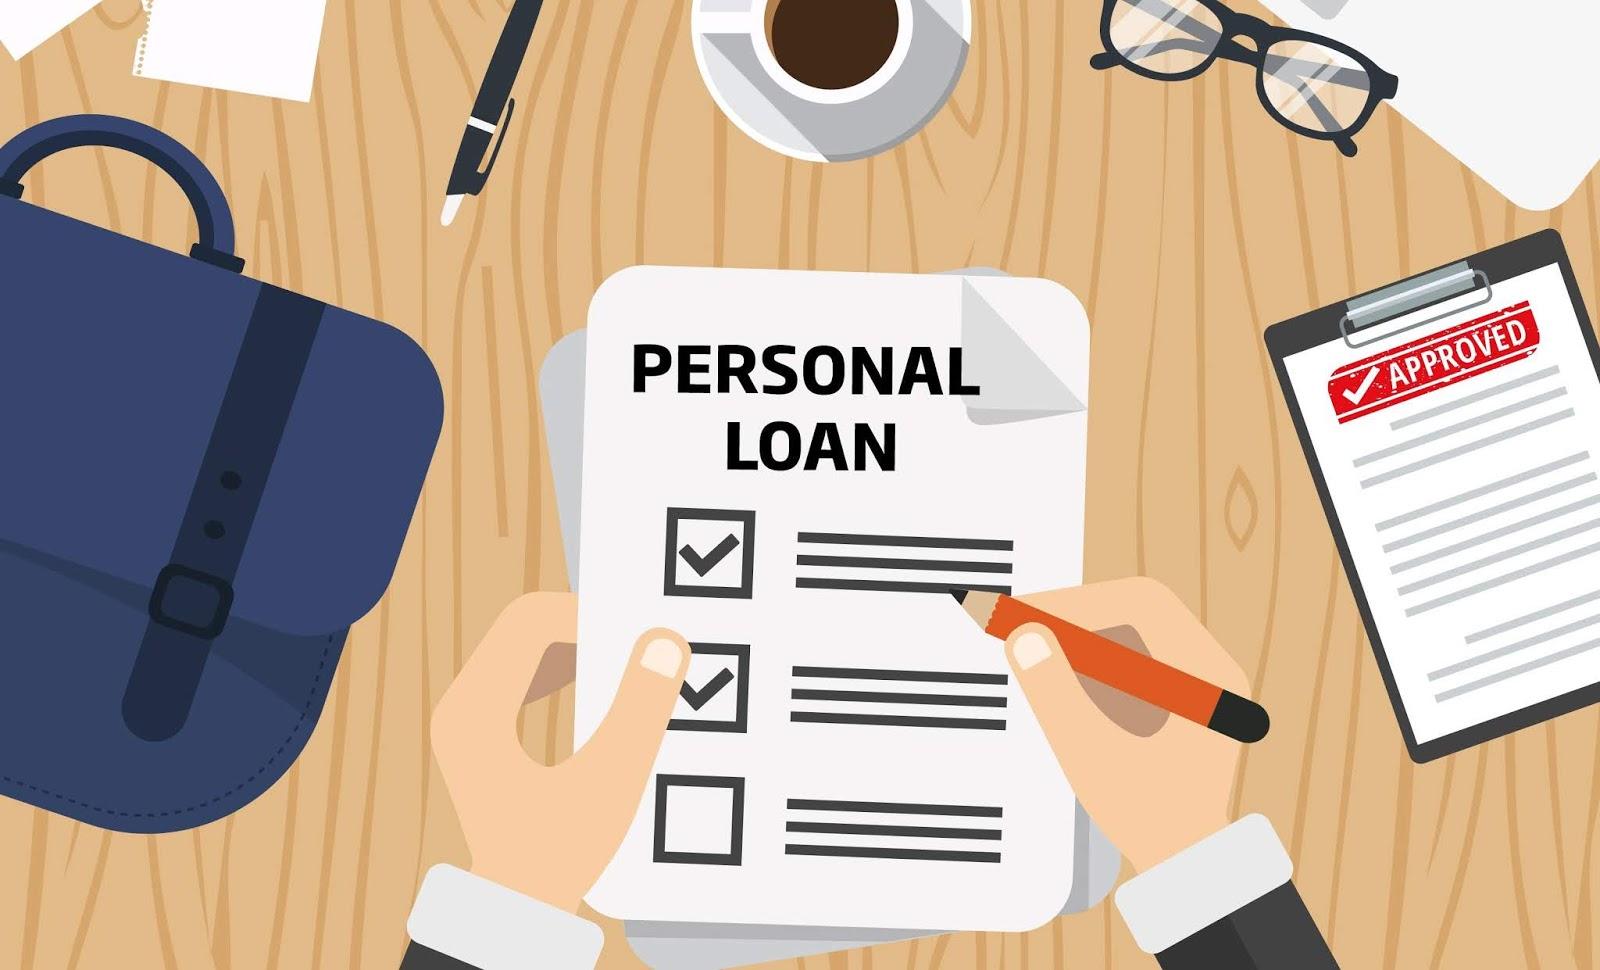 Personal Loan Applications